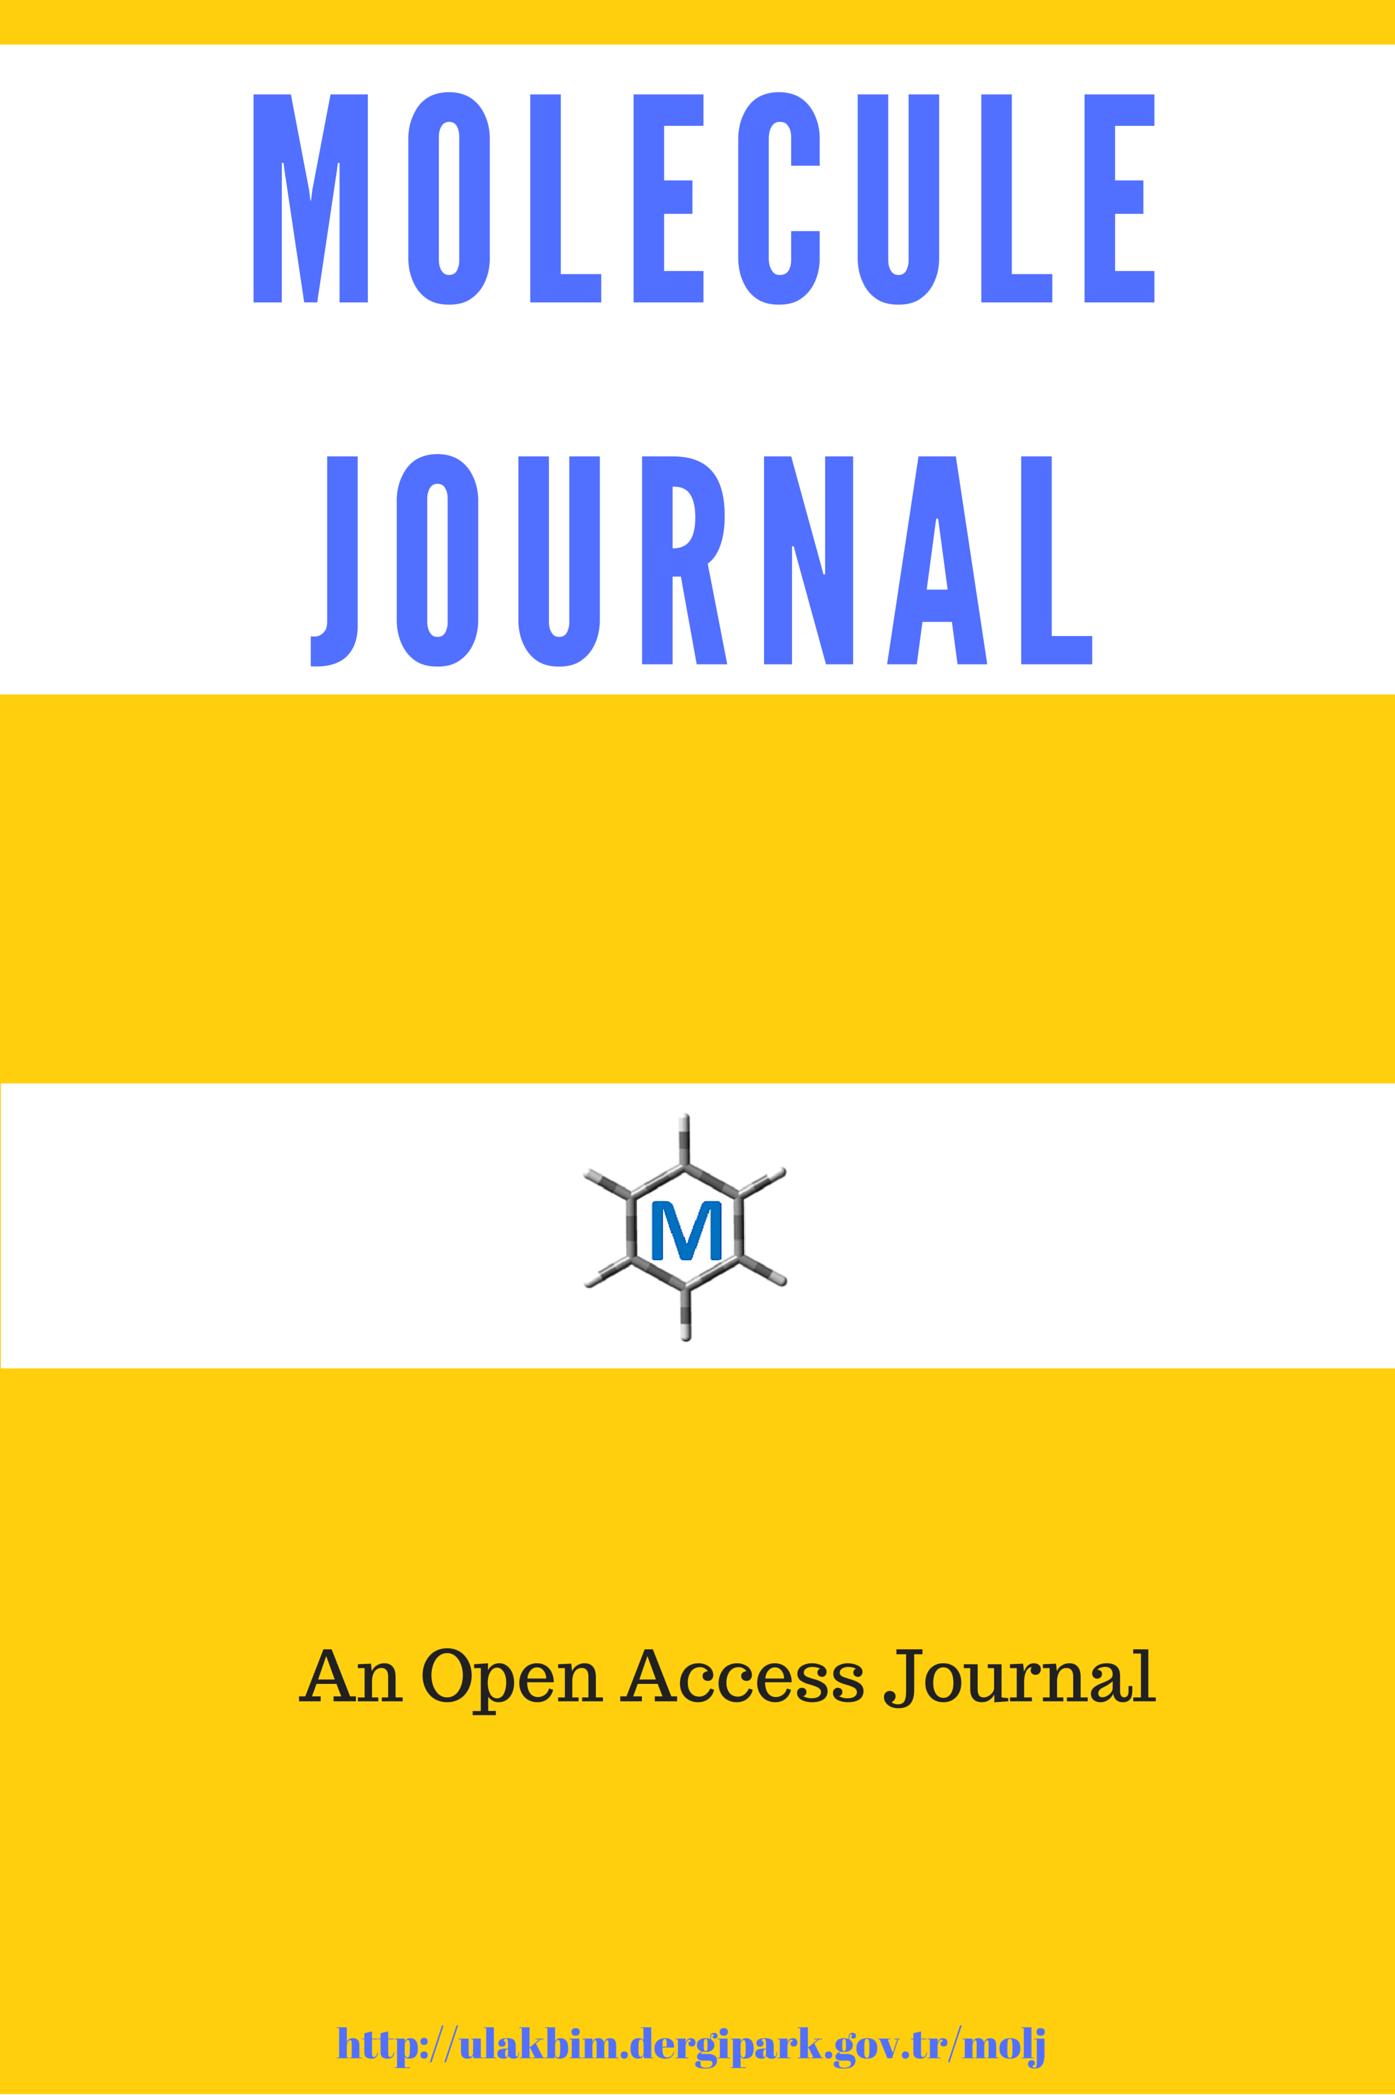 Molecule Journal